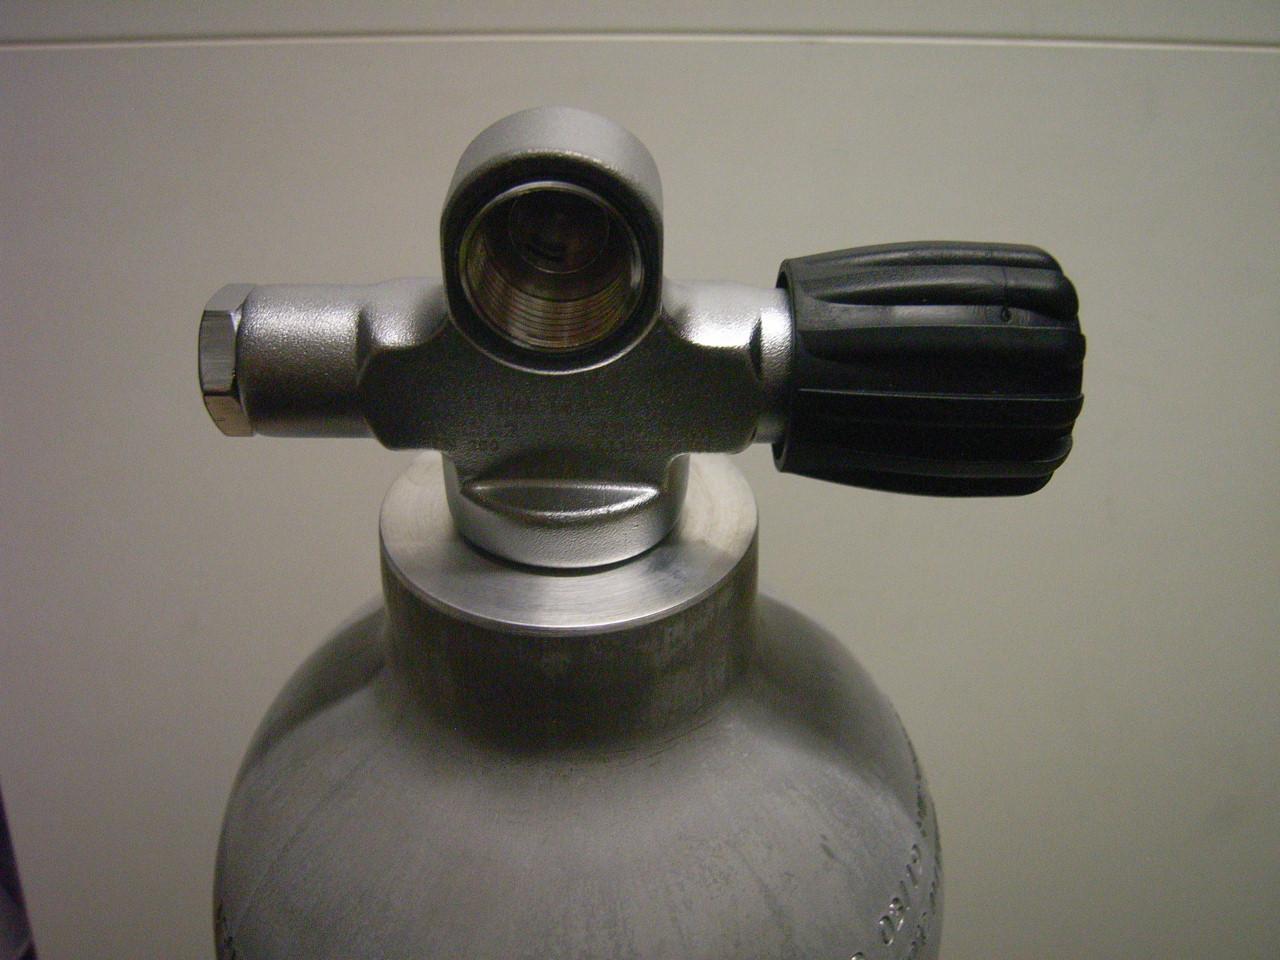 Luxfer Alu 7 Liter natur mit Brückenventil links 71020